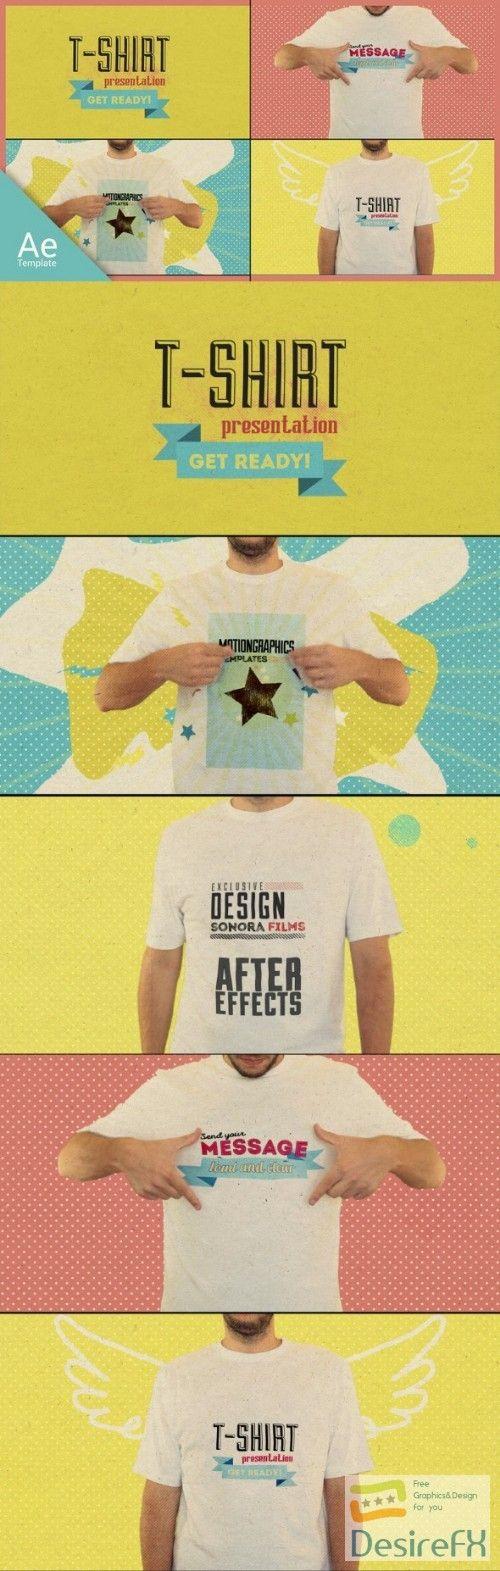 Download Download Videohive T Shirt Opener 15488015 Desirefx Com Message T Shirts T Shirt Shirts